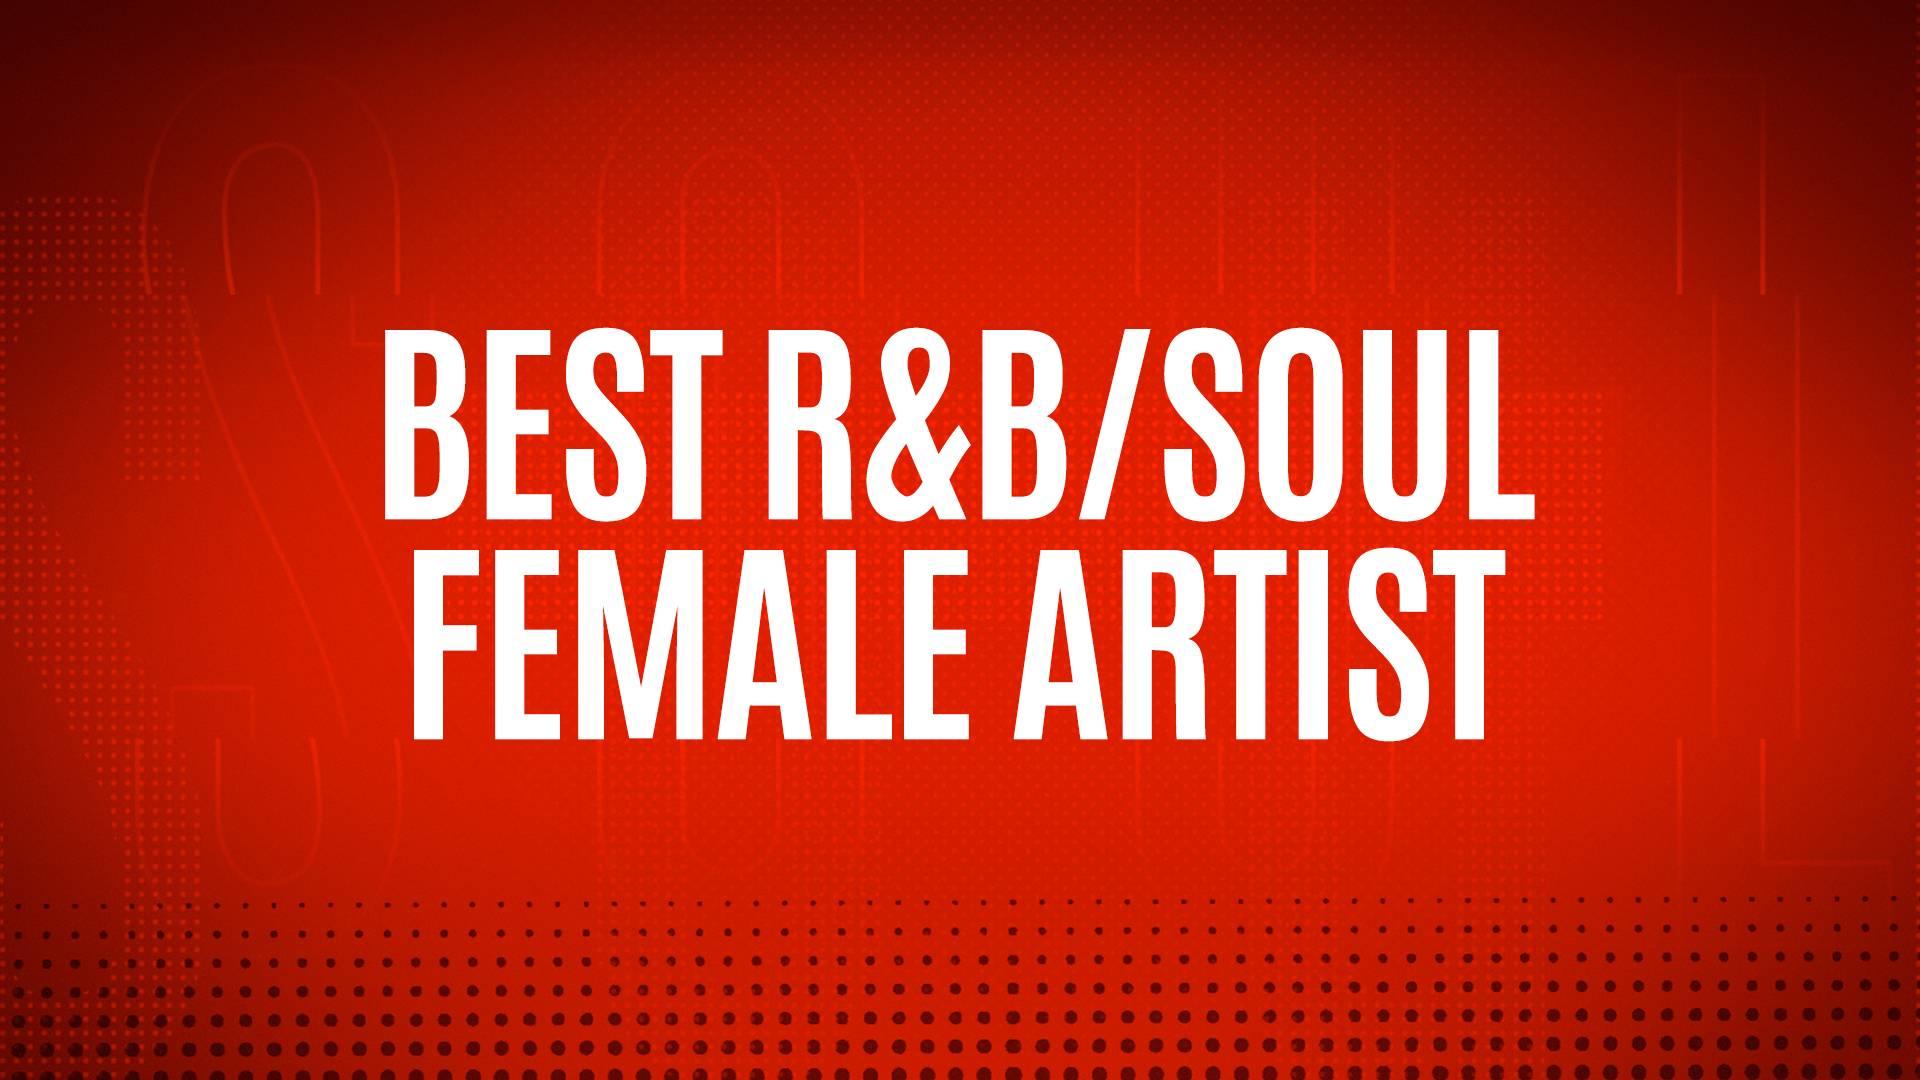 NOMINEES - BEST R&B/SOUL FEMALE ARTIST